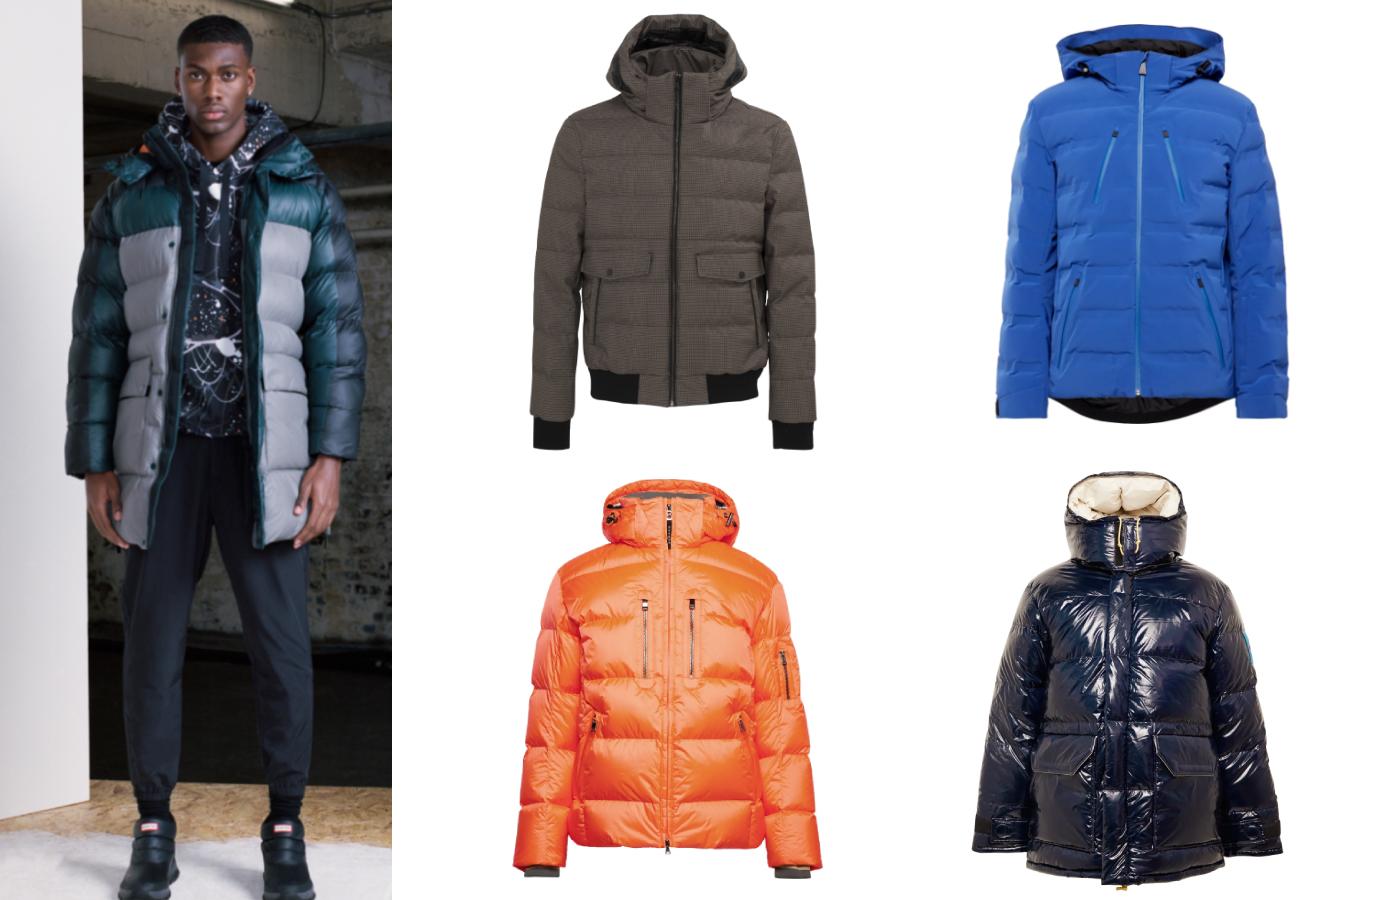 Men's après-ski jackets